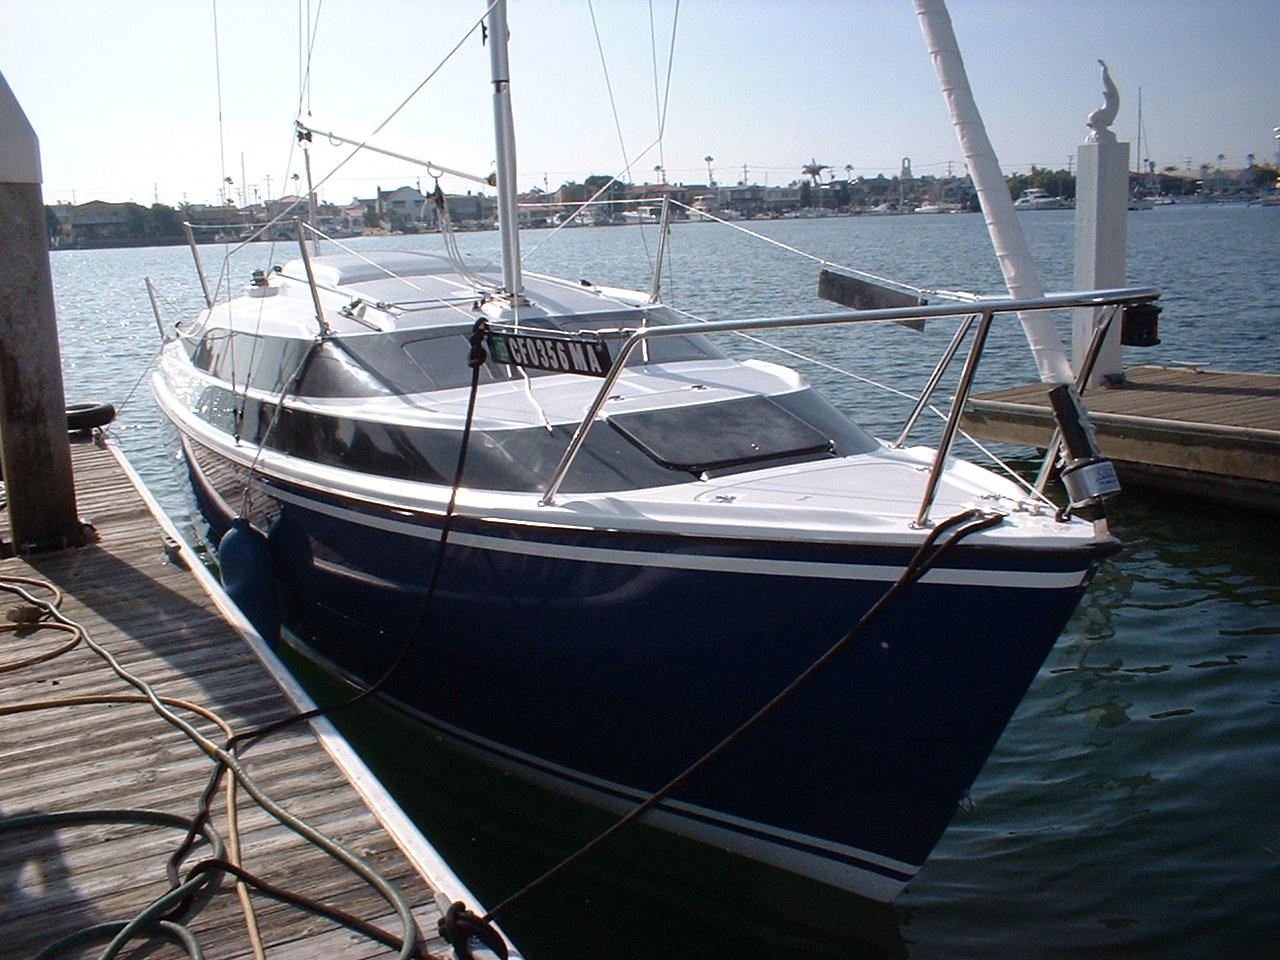 MacGregor 26M at dock